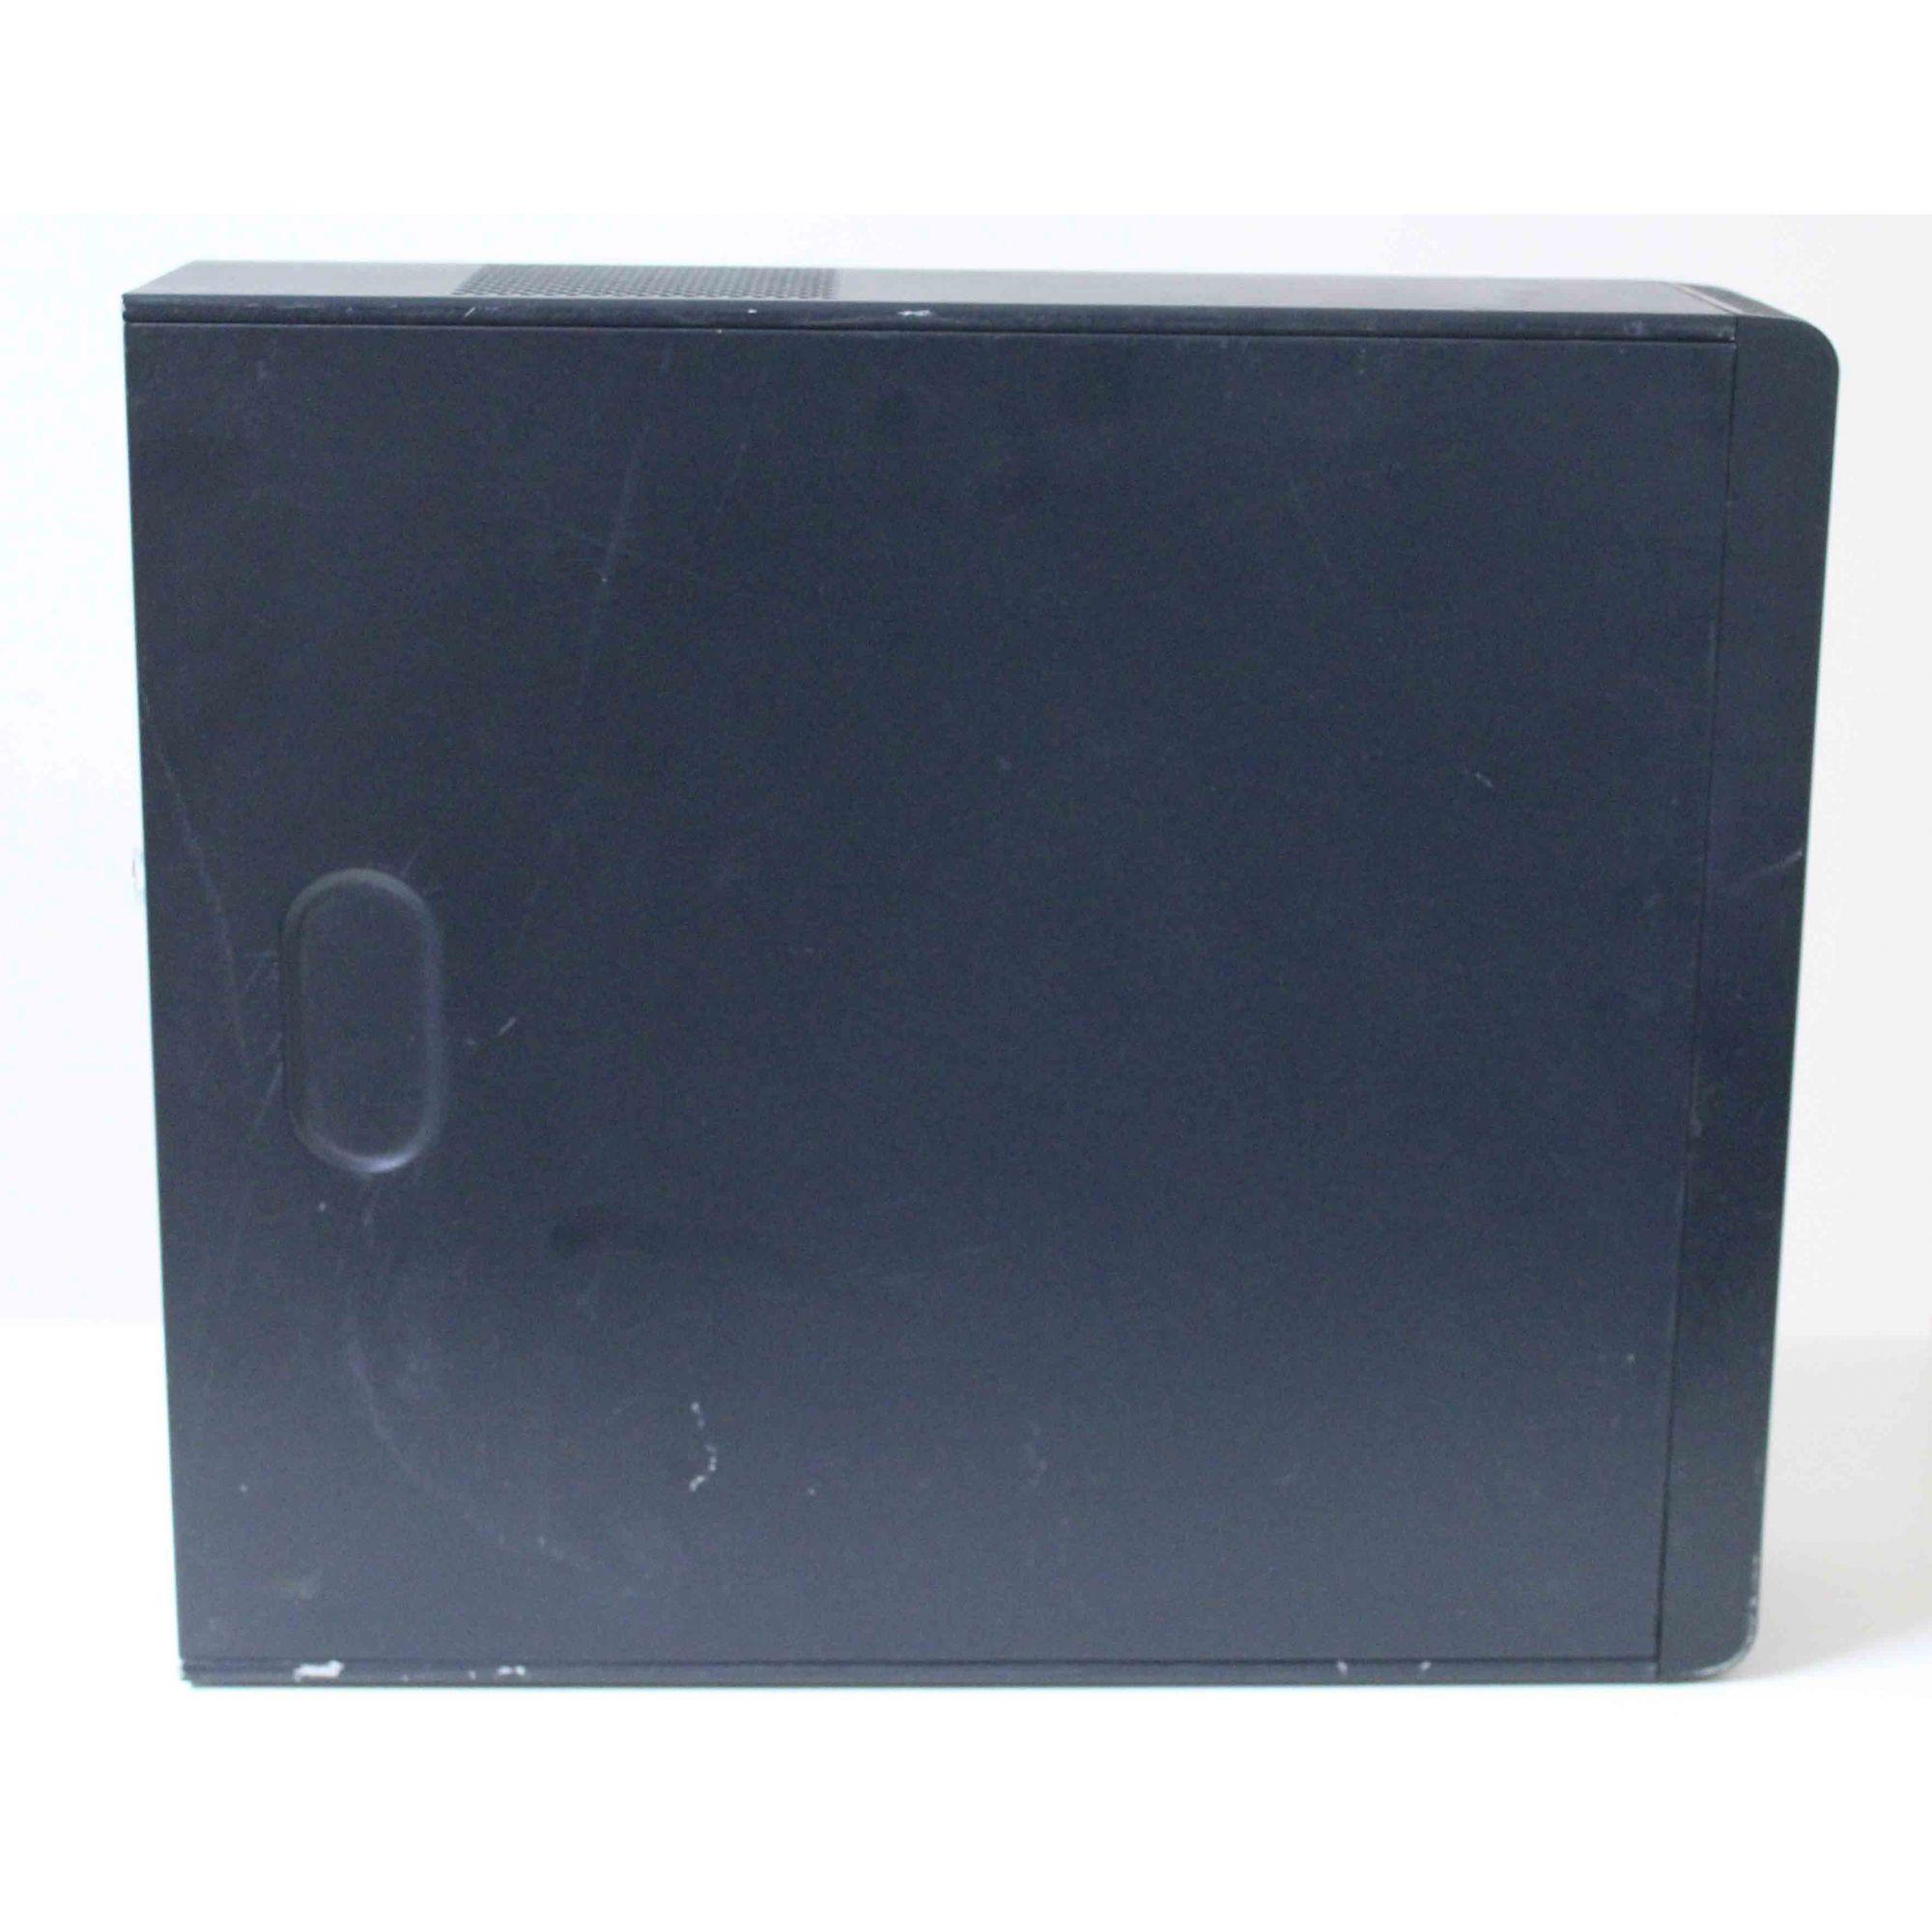 Computador HP Compaq DX 7400 Core 2 Duo 2.2GHz 3GB HD-160GB